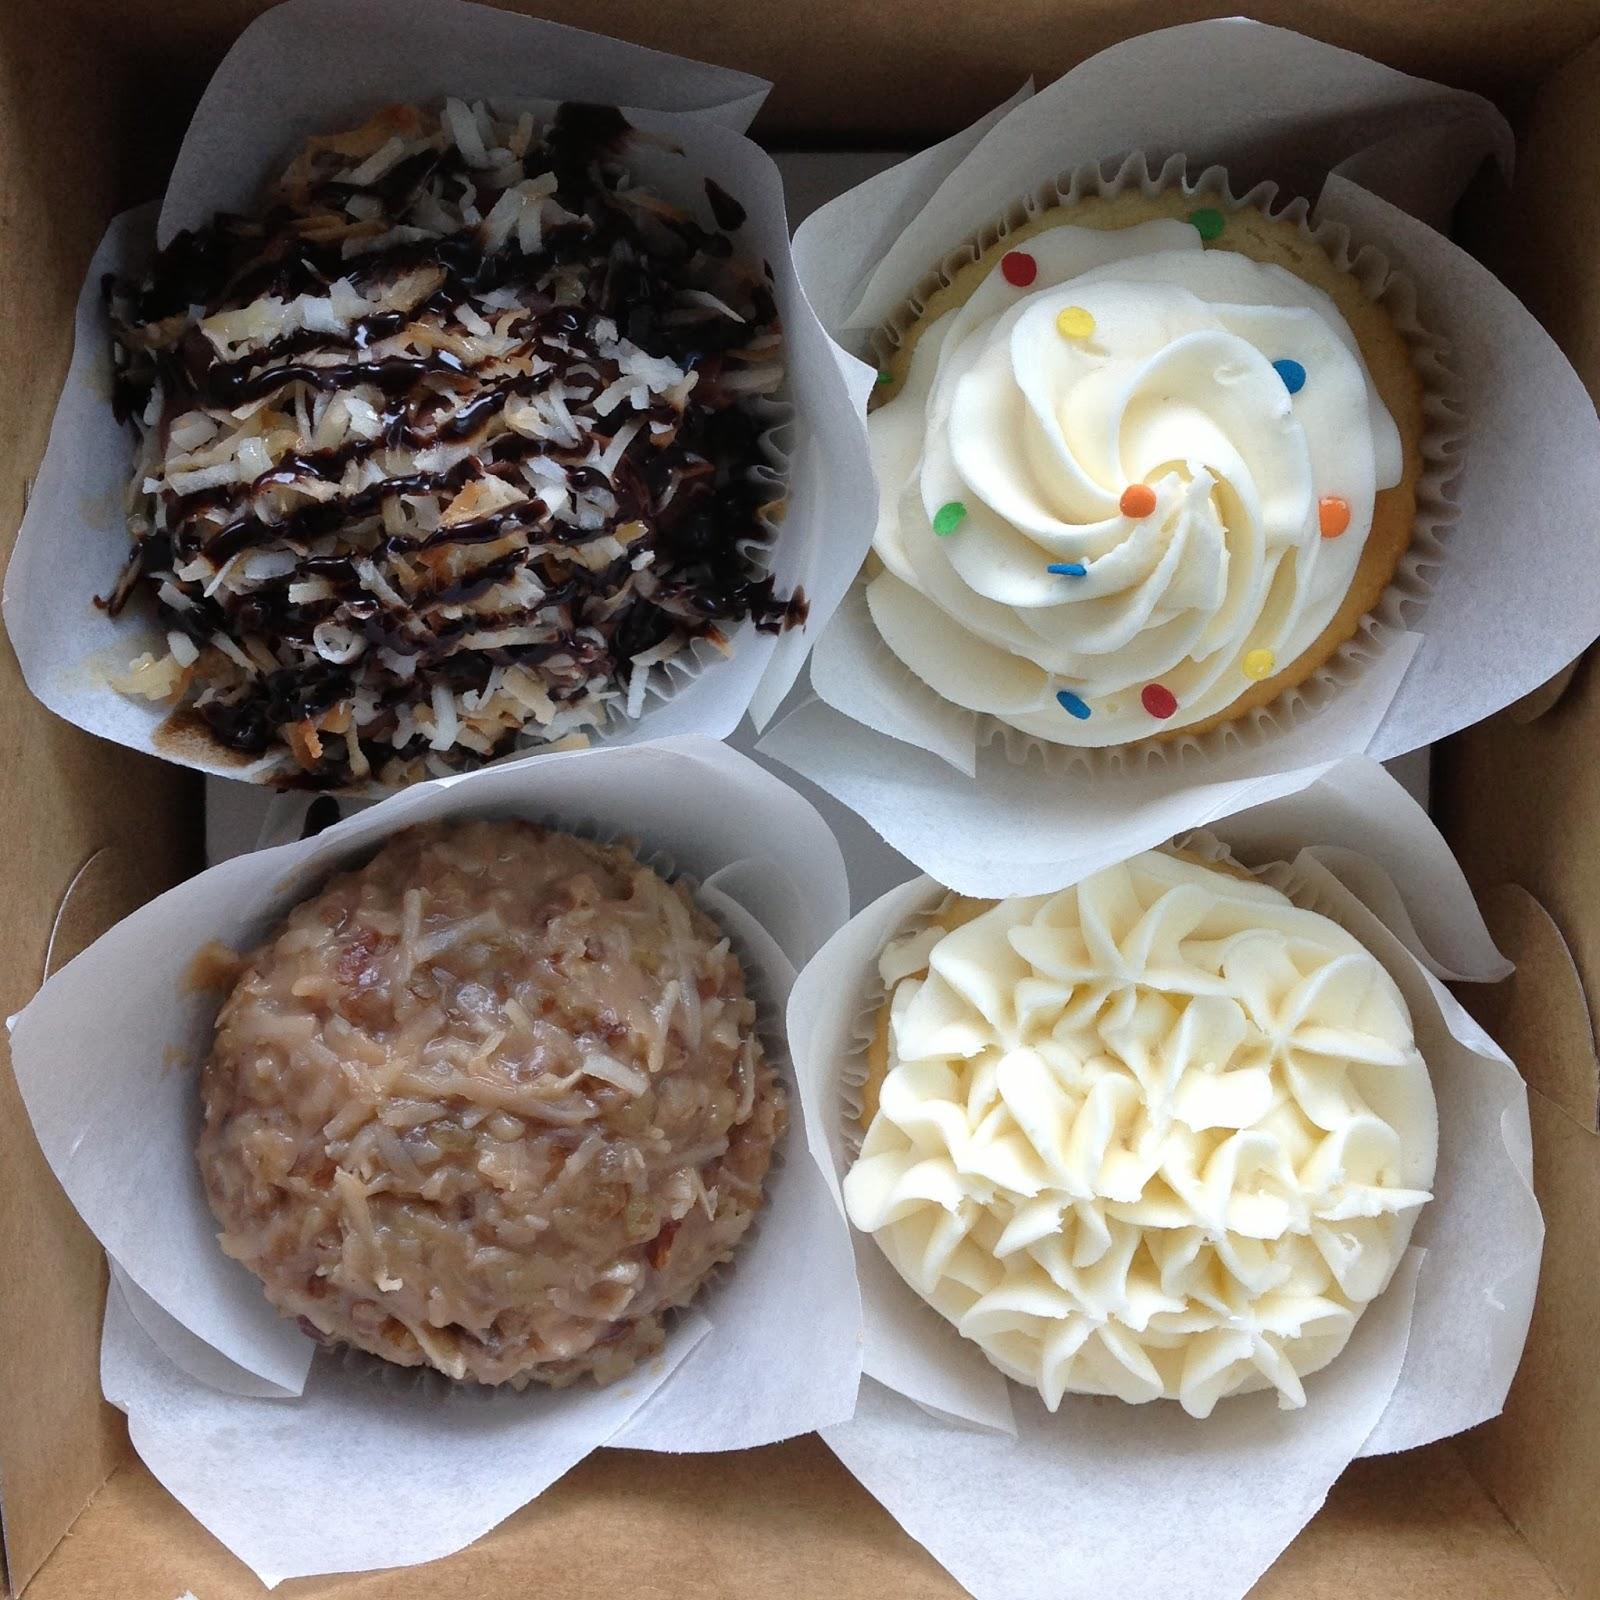 Sweet NOLA Cupcakes Bakery